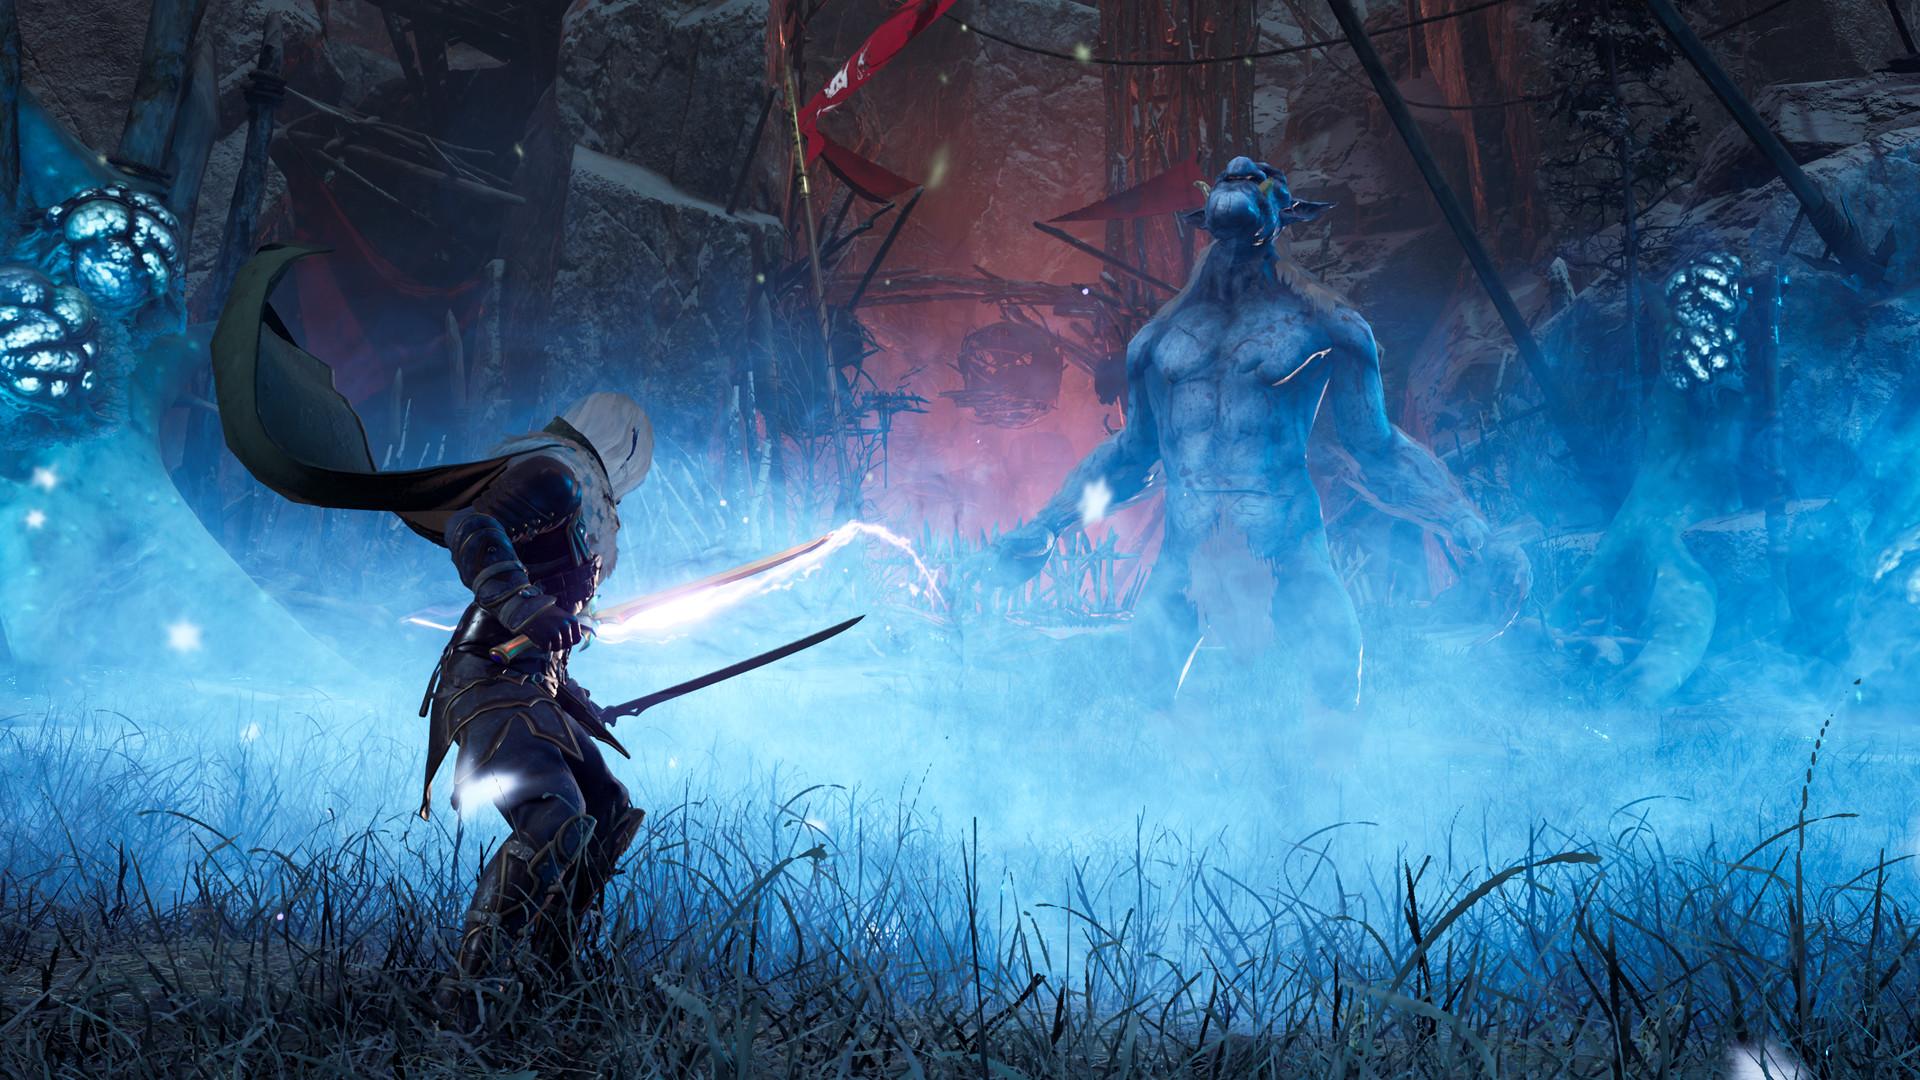 dungeons-and-dragons-dark-alliance-pc-screenshot-1